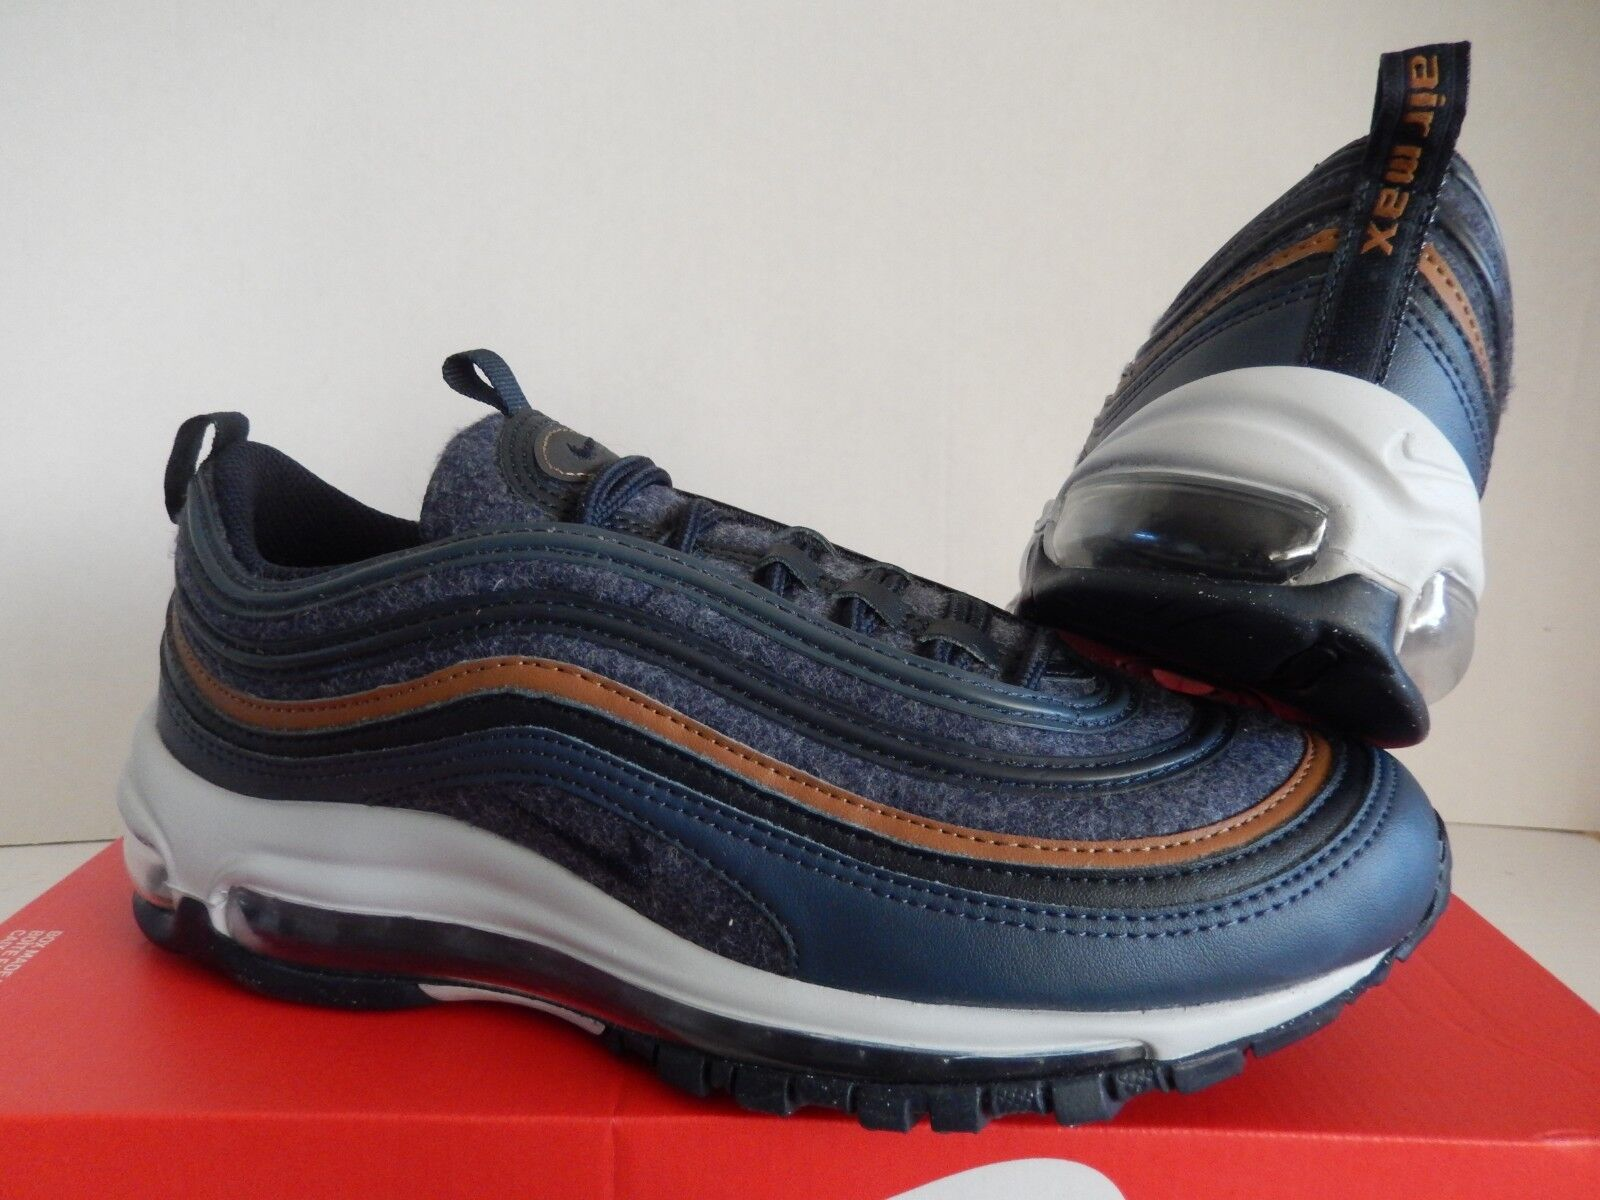 511b61feee6 Nike Air Max 97 SE Big Kids Style 923288 923288-400 Thunder Blue Sz ...